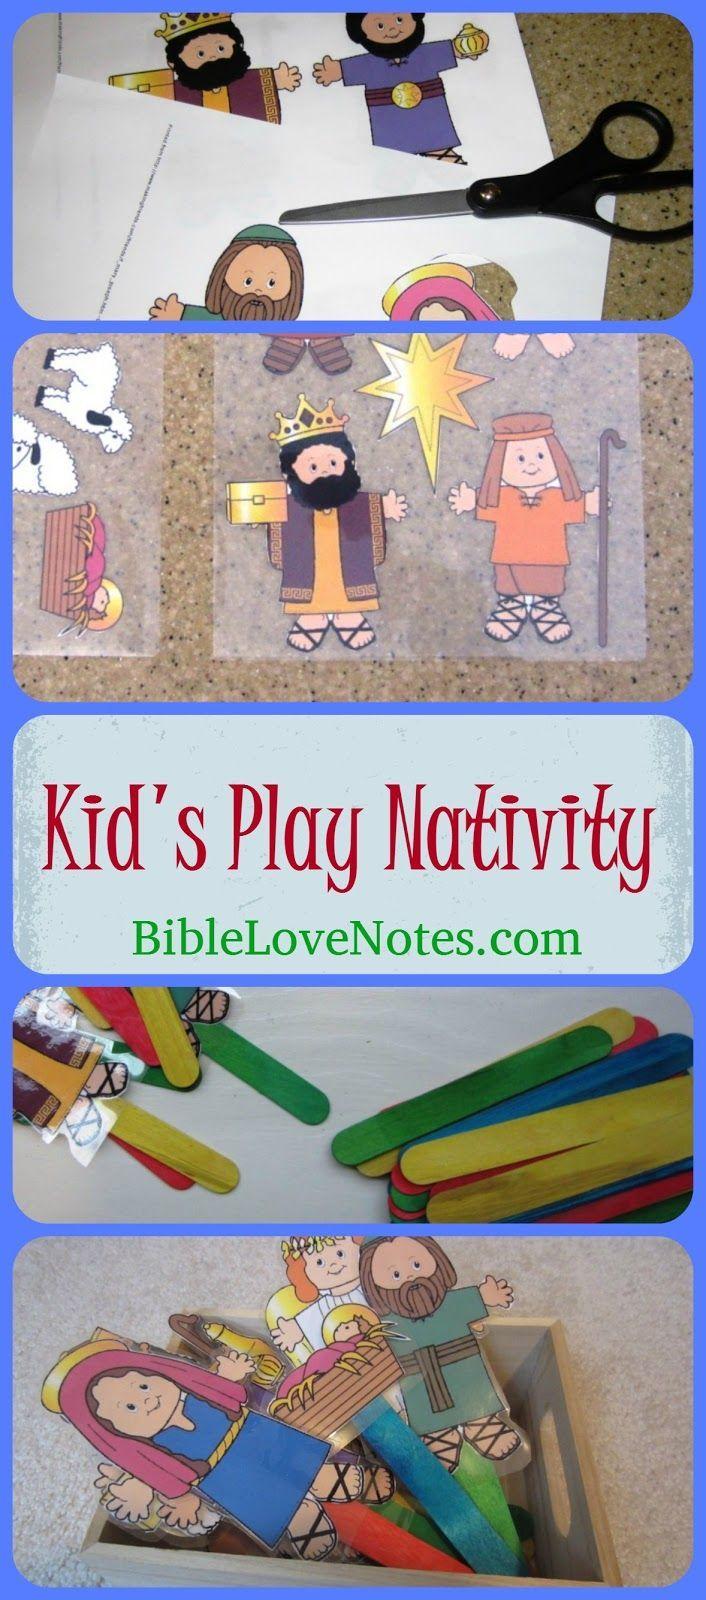 Children's Play Nativity